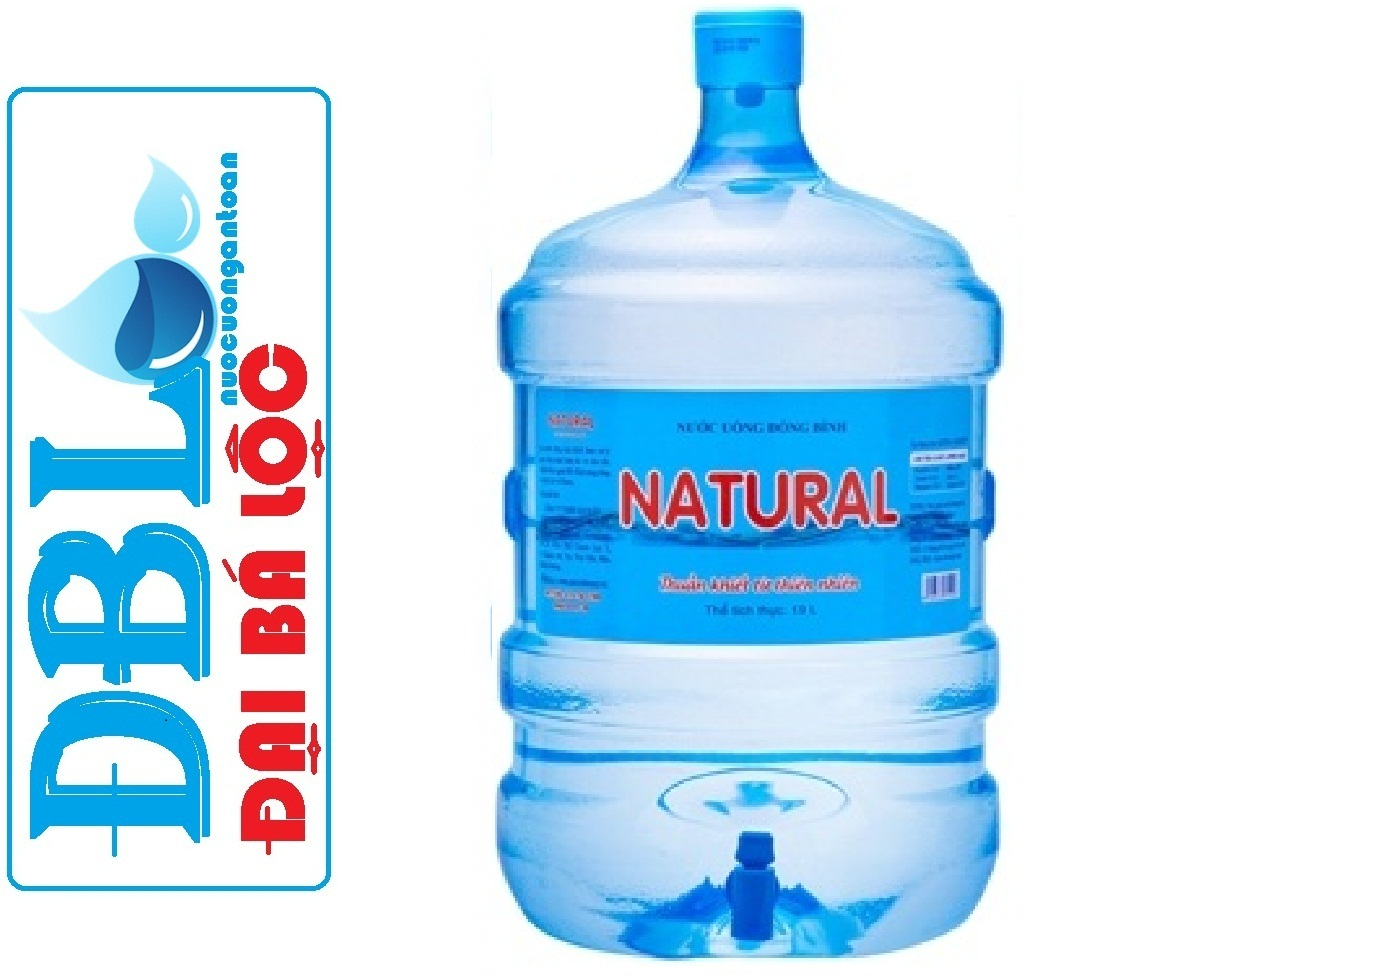 nuoc natural binh 20l